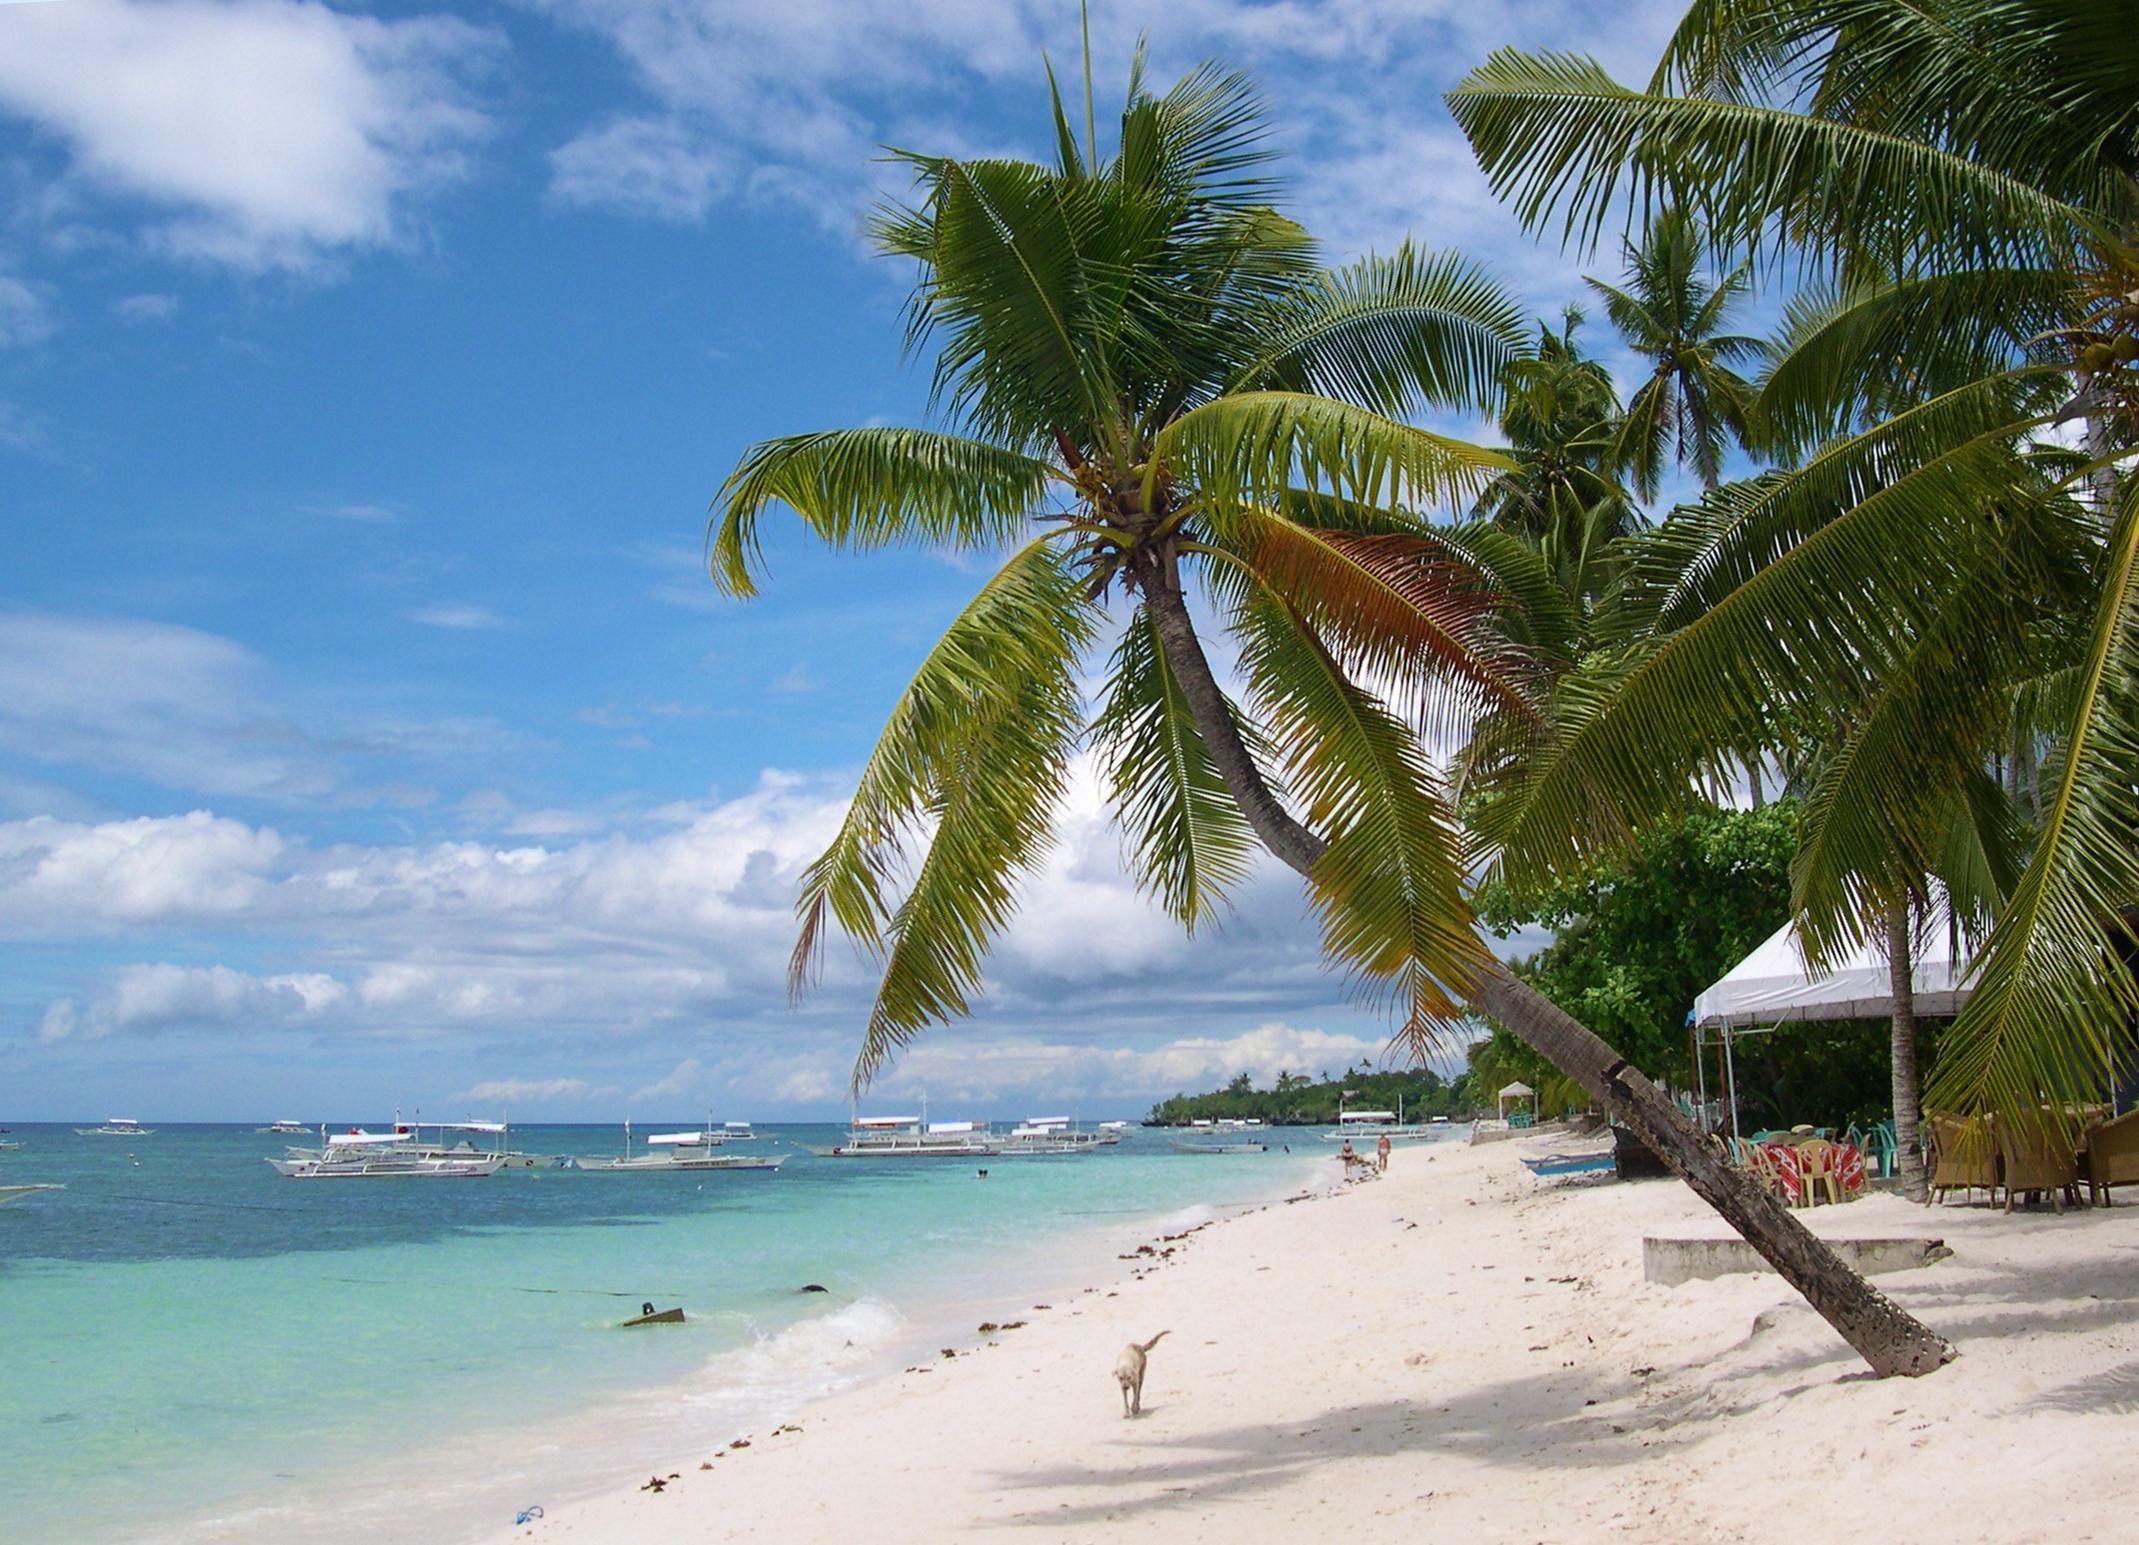 North Palm Beach Fl Attractions